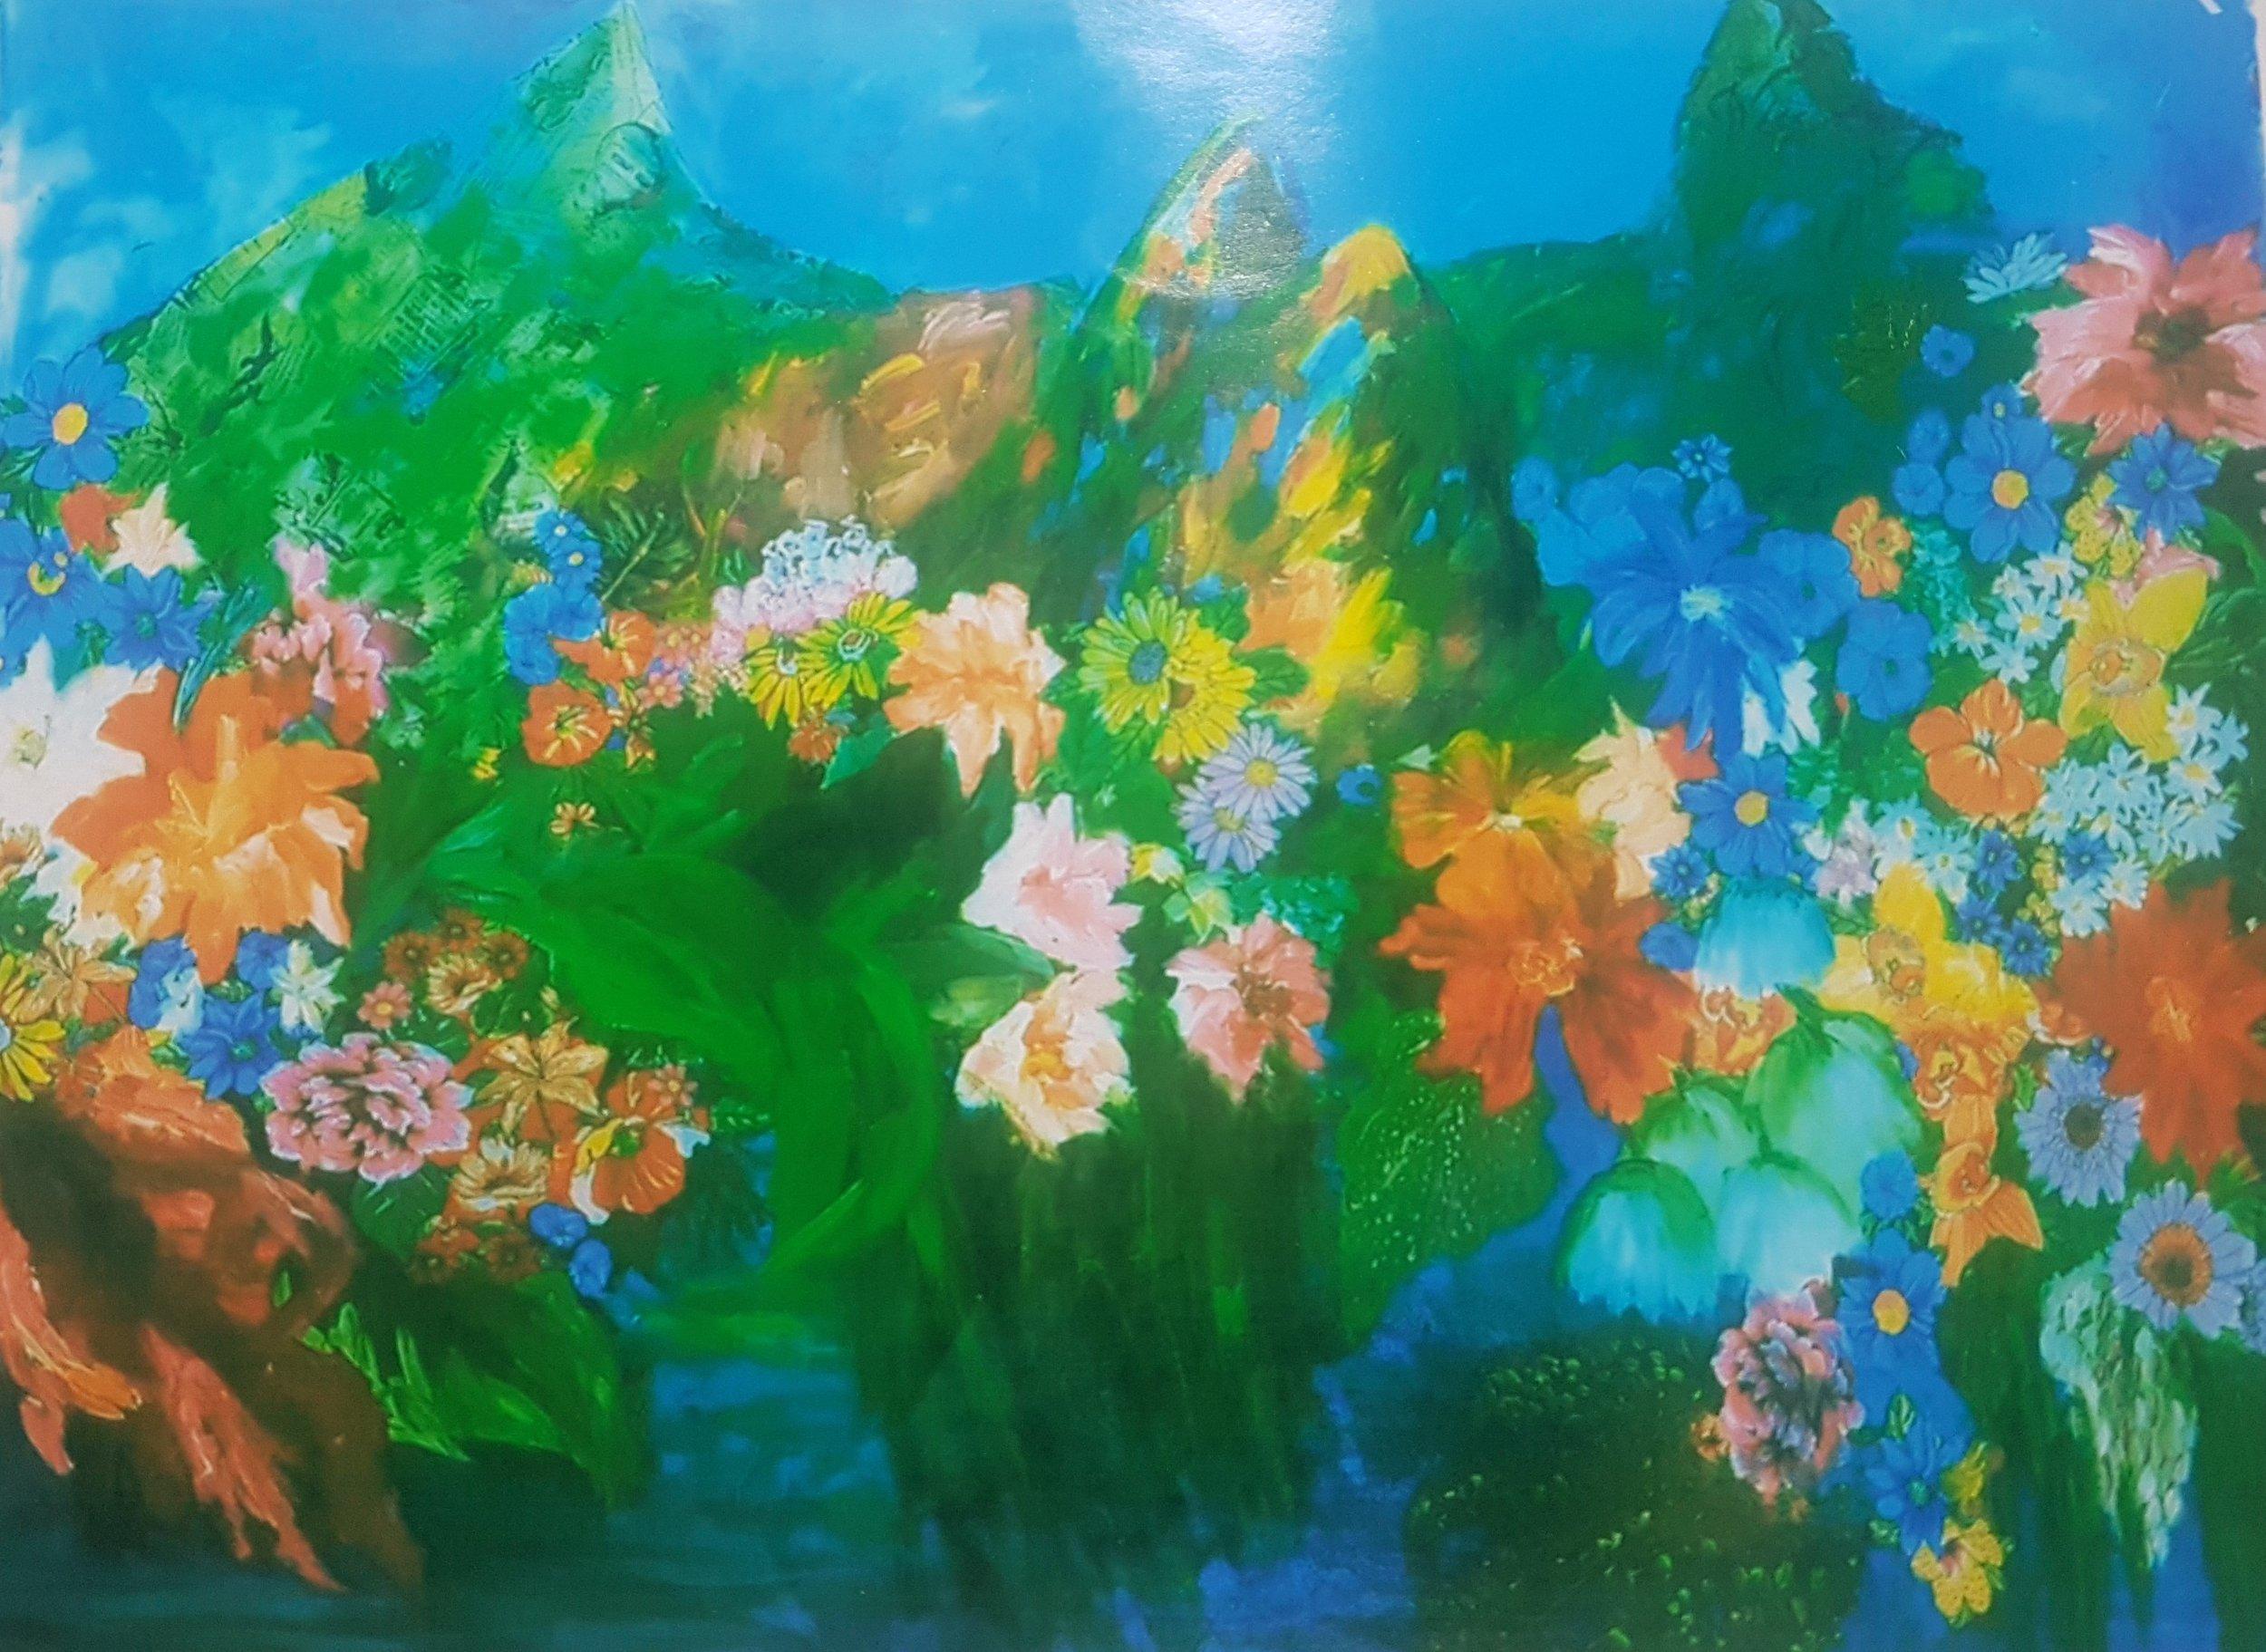 Dirce Fett, Aporia, acrílica s/tela, 120 x 200 cm